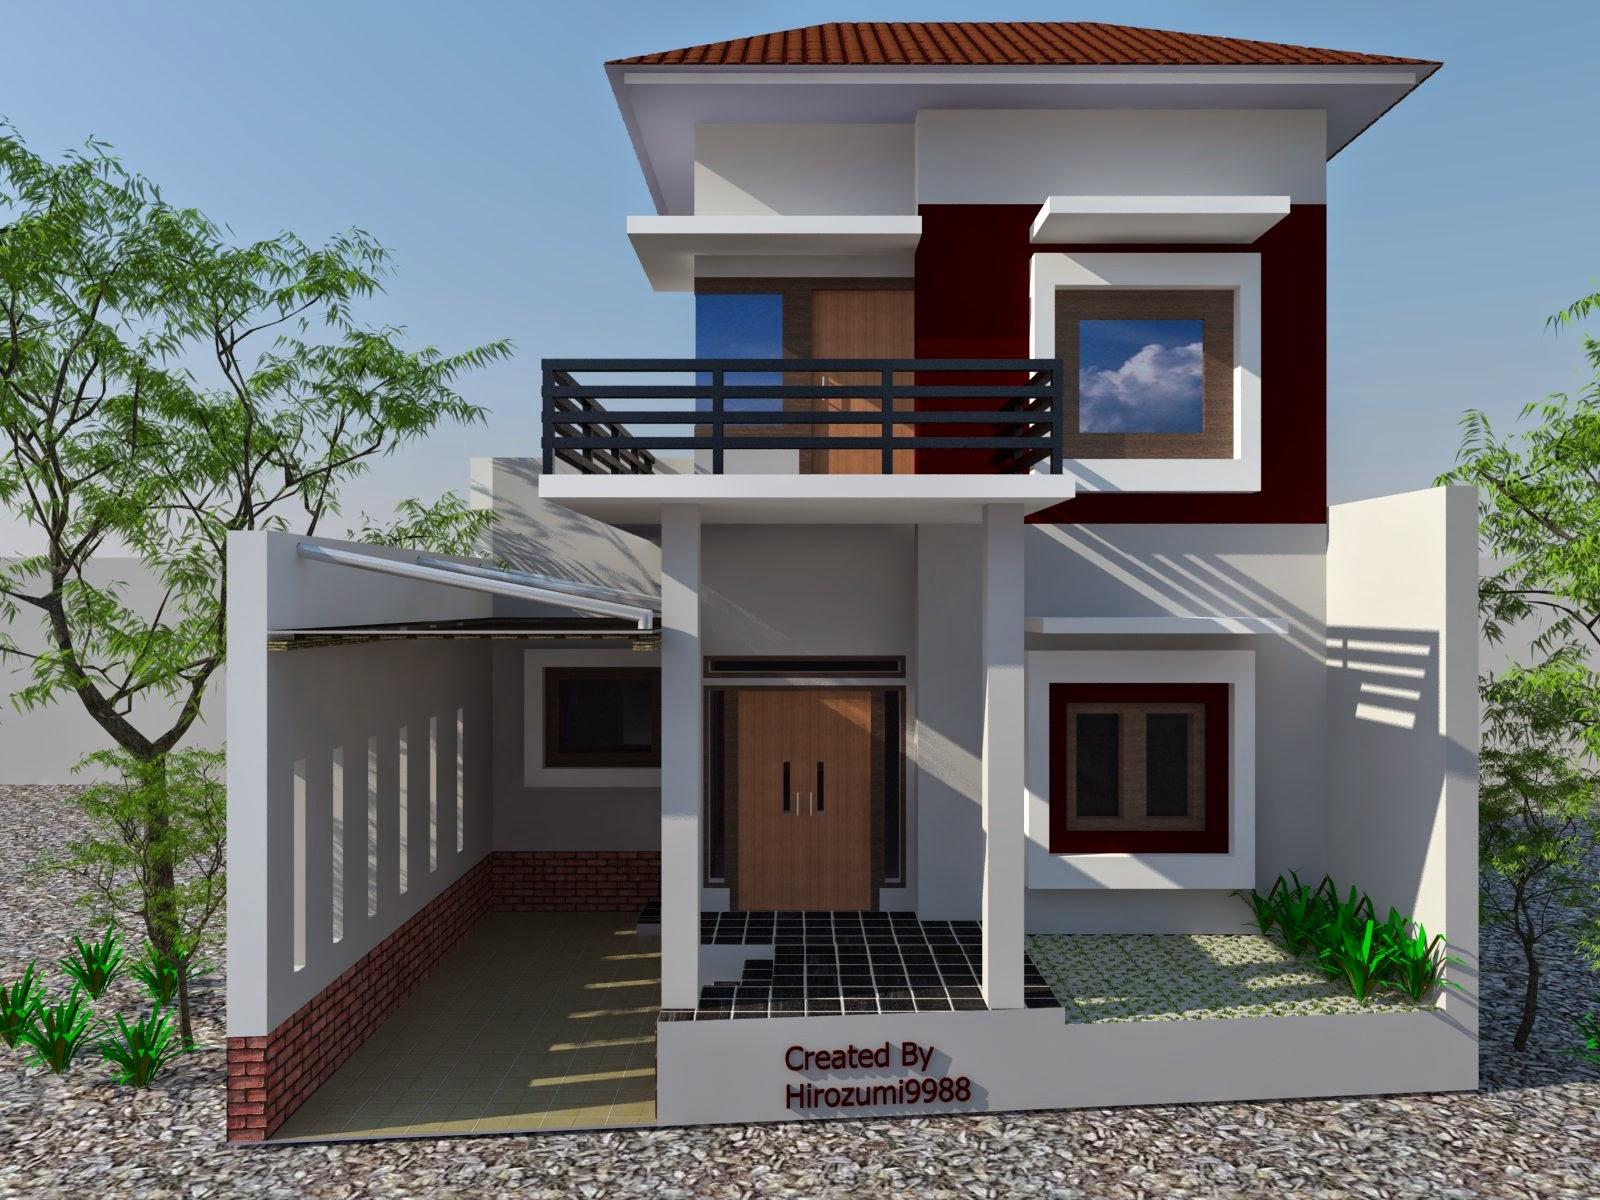 Kumpulan Rumah Minimalis Sederhana 2 Lantai Desain Rumah Minimalis